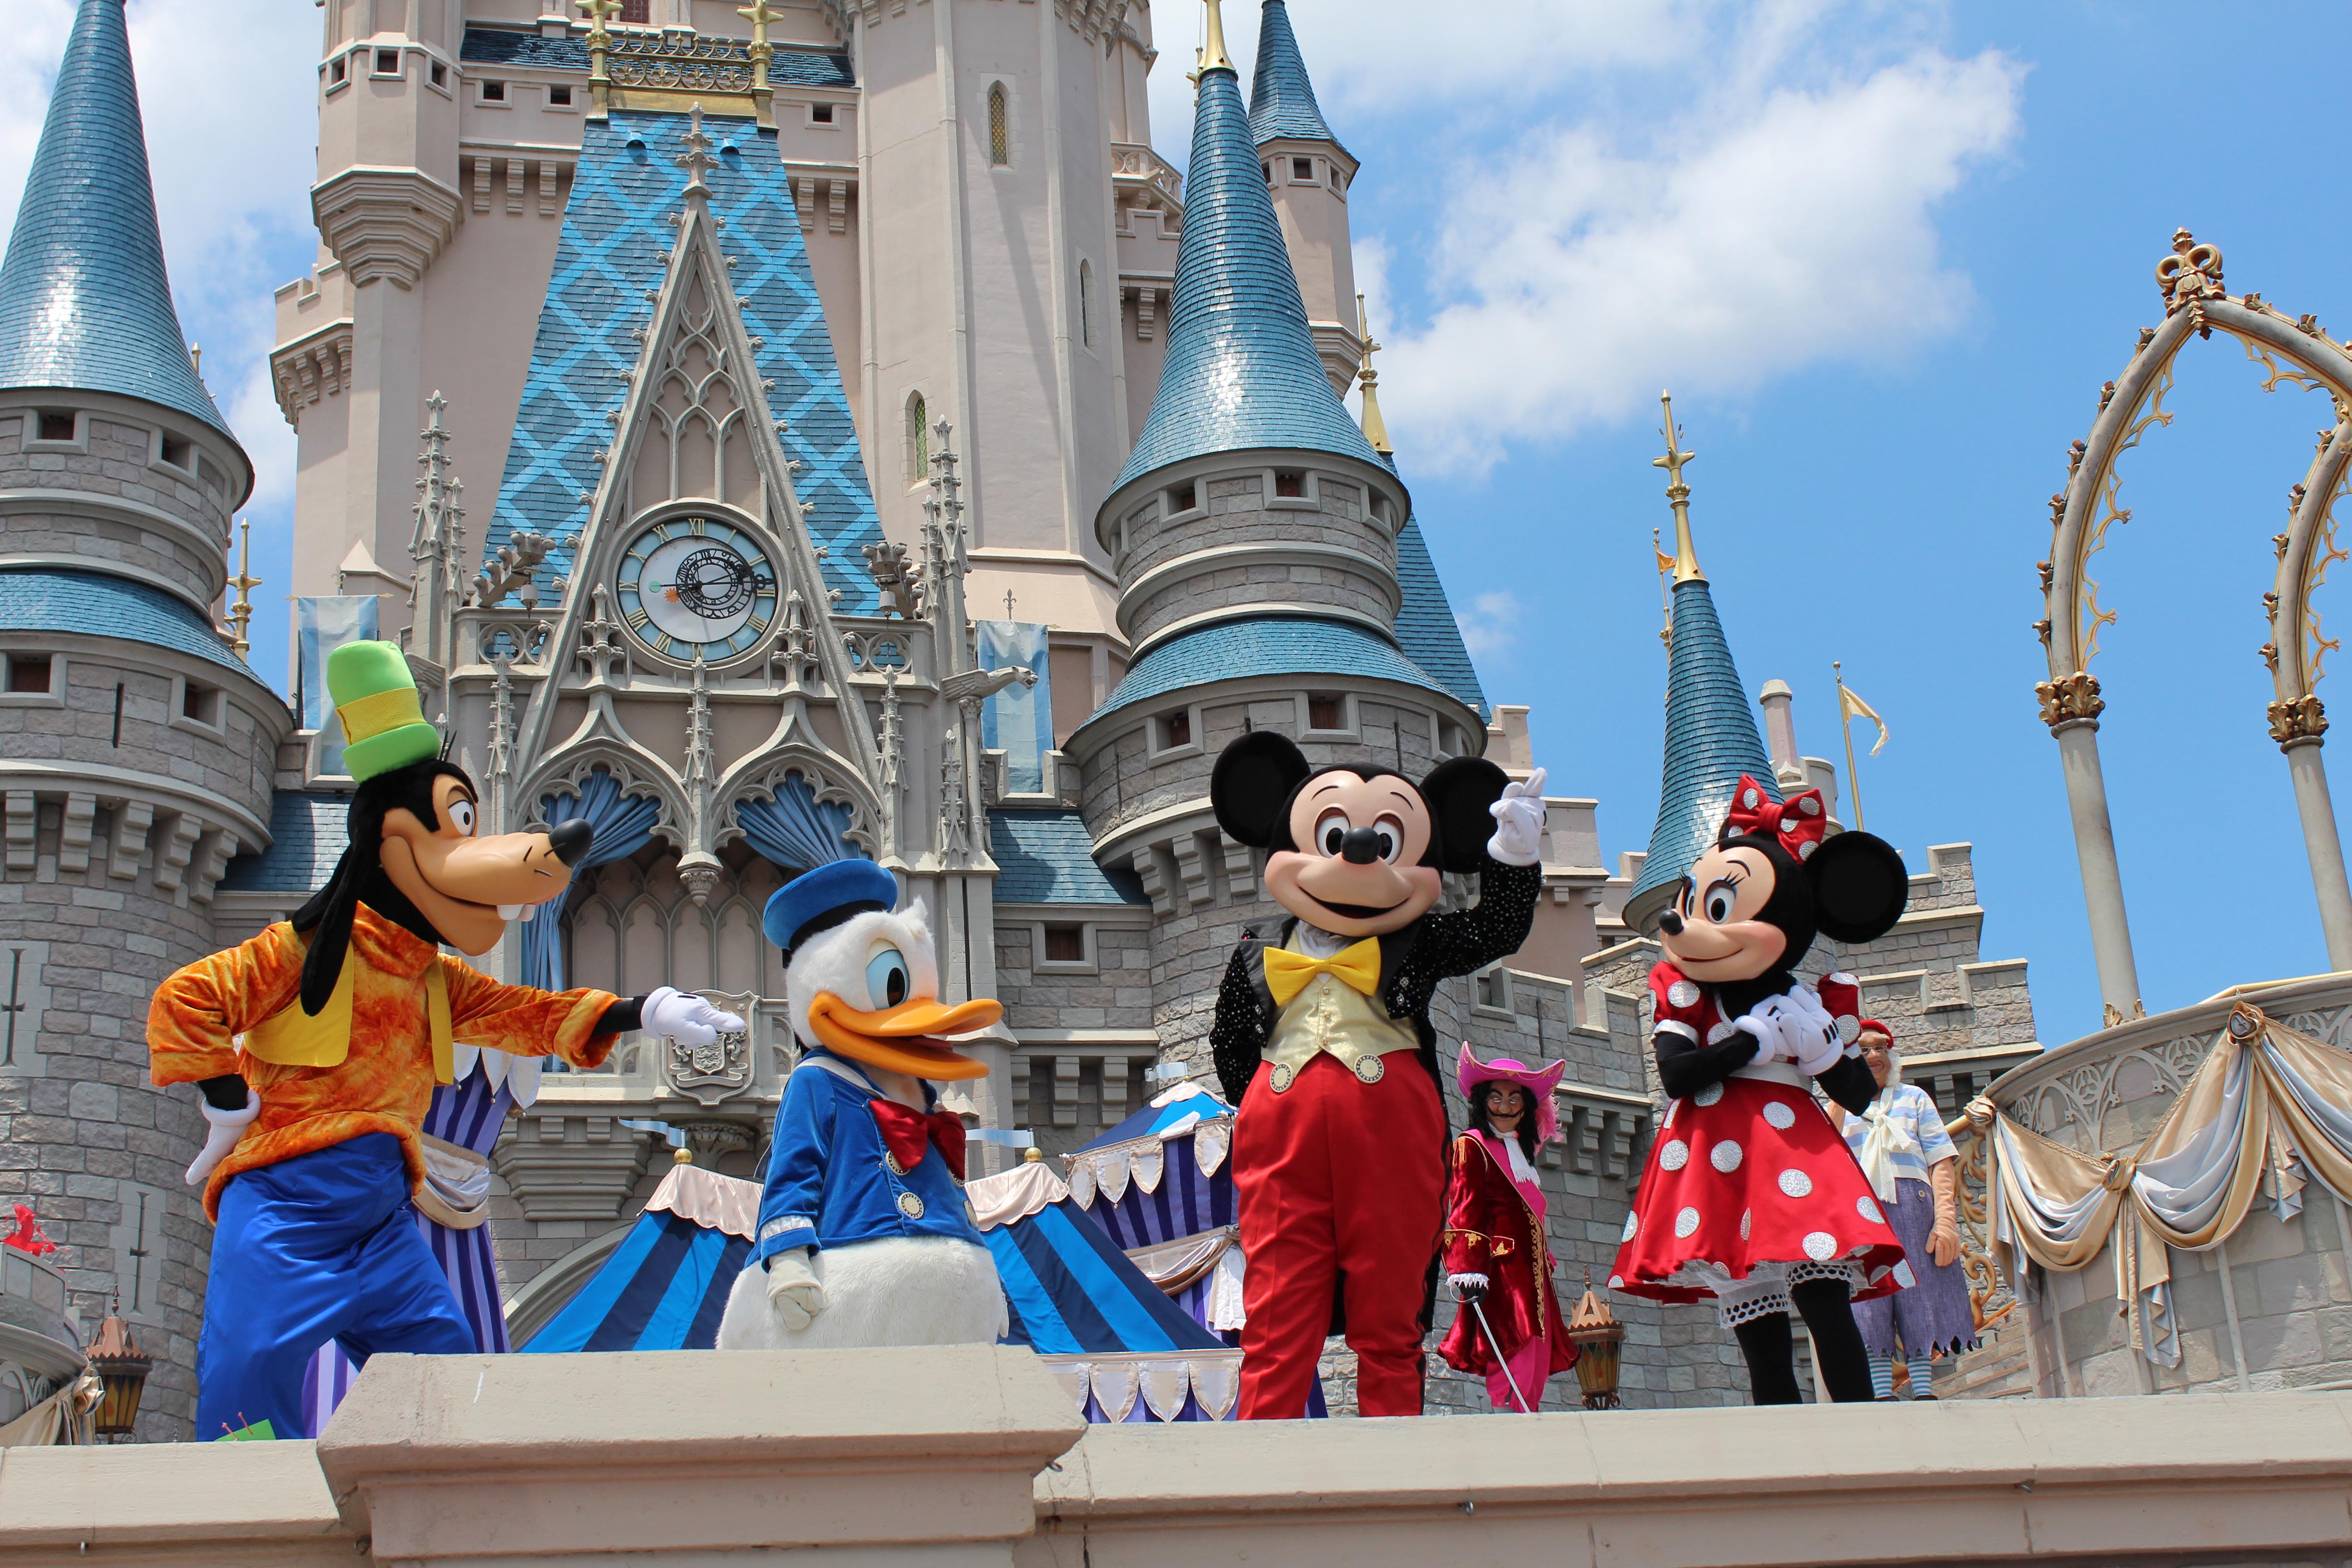 Mickey, Minnie, Donald, and Goofy